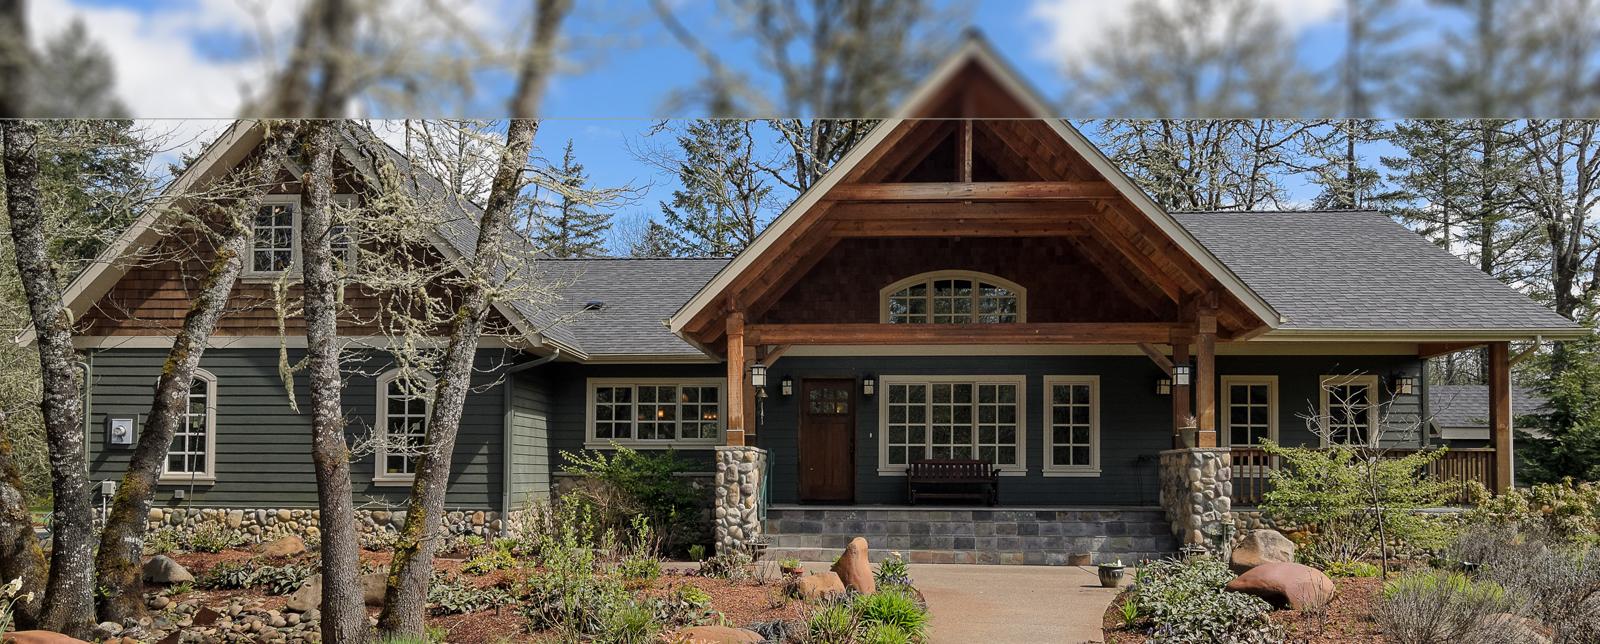 Amazing Craftsman Style Home